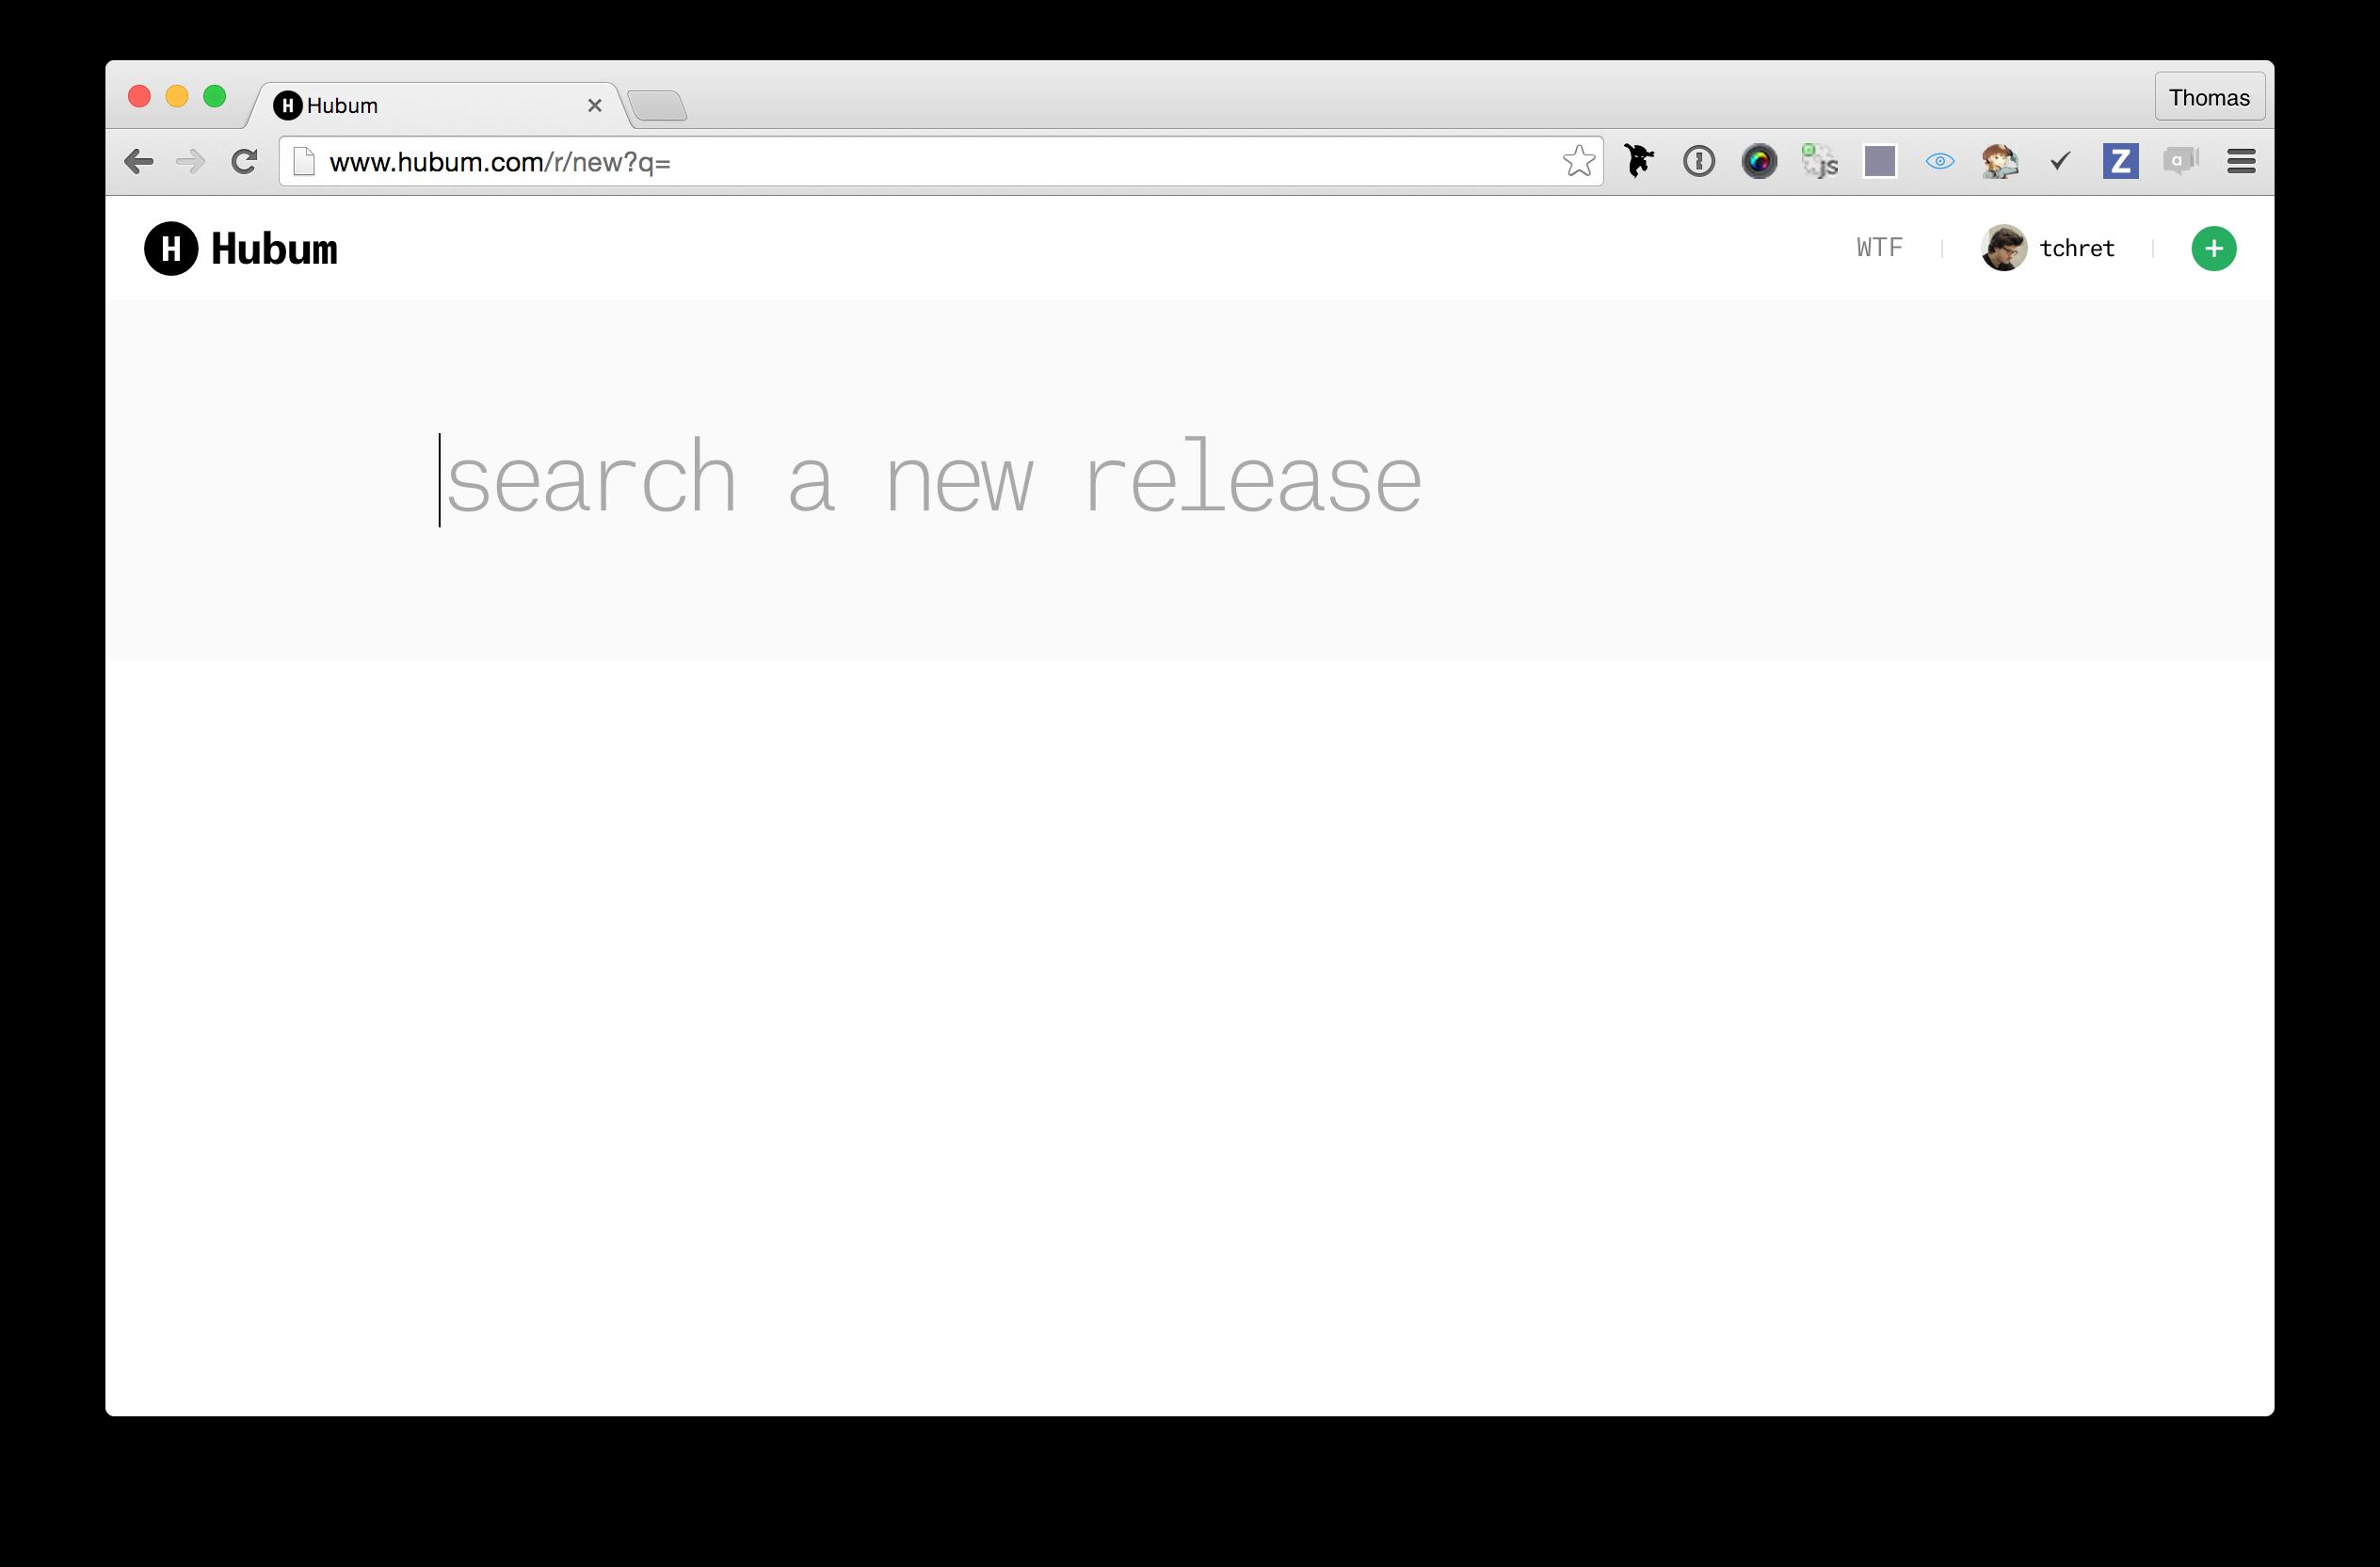 hubum-search